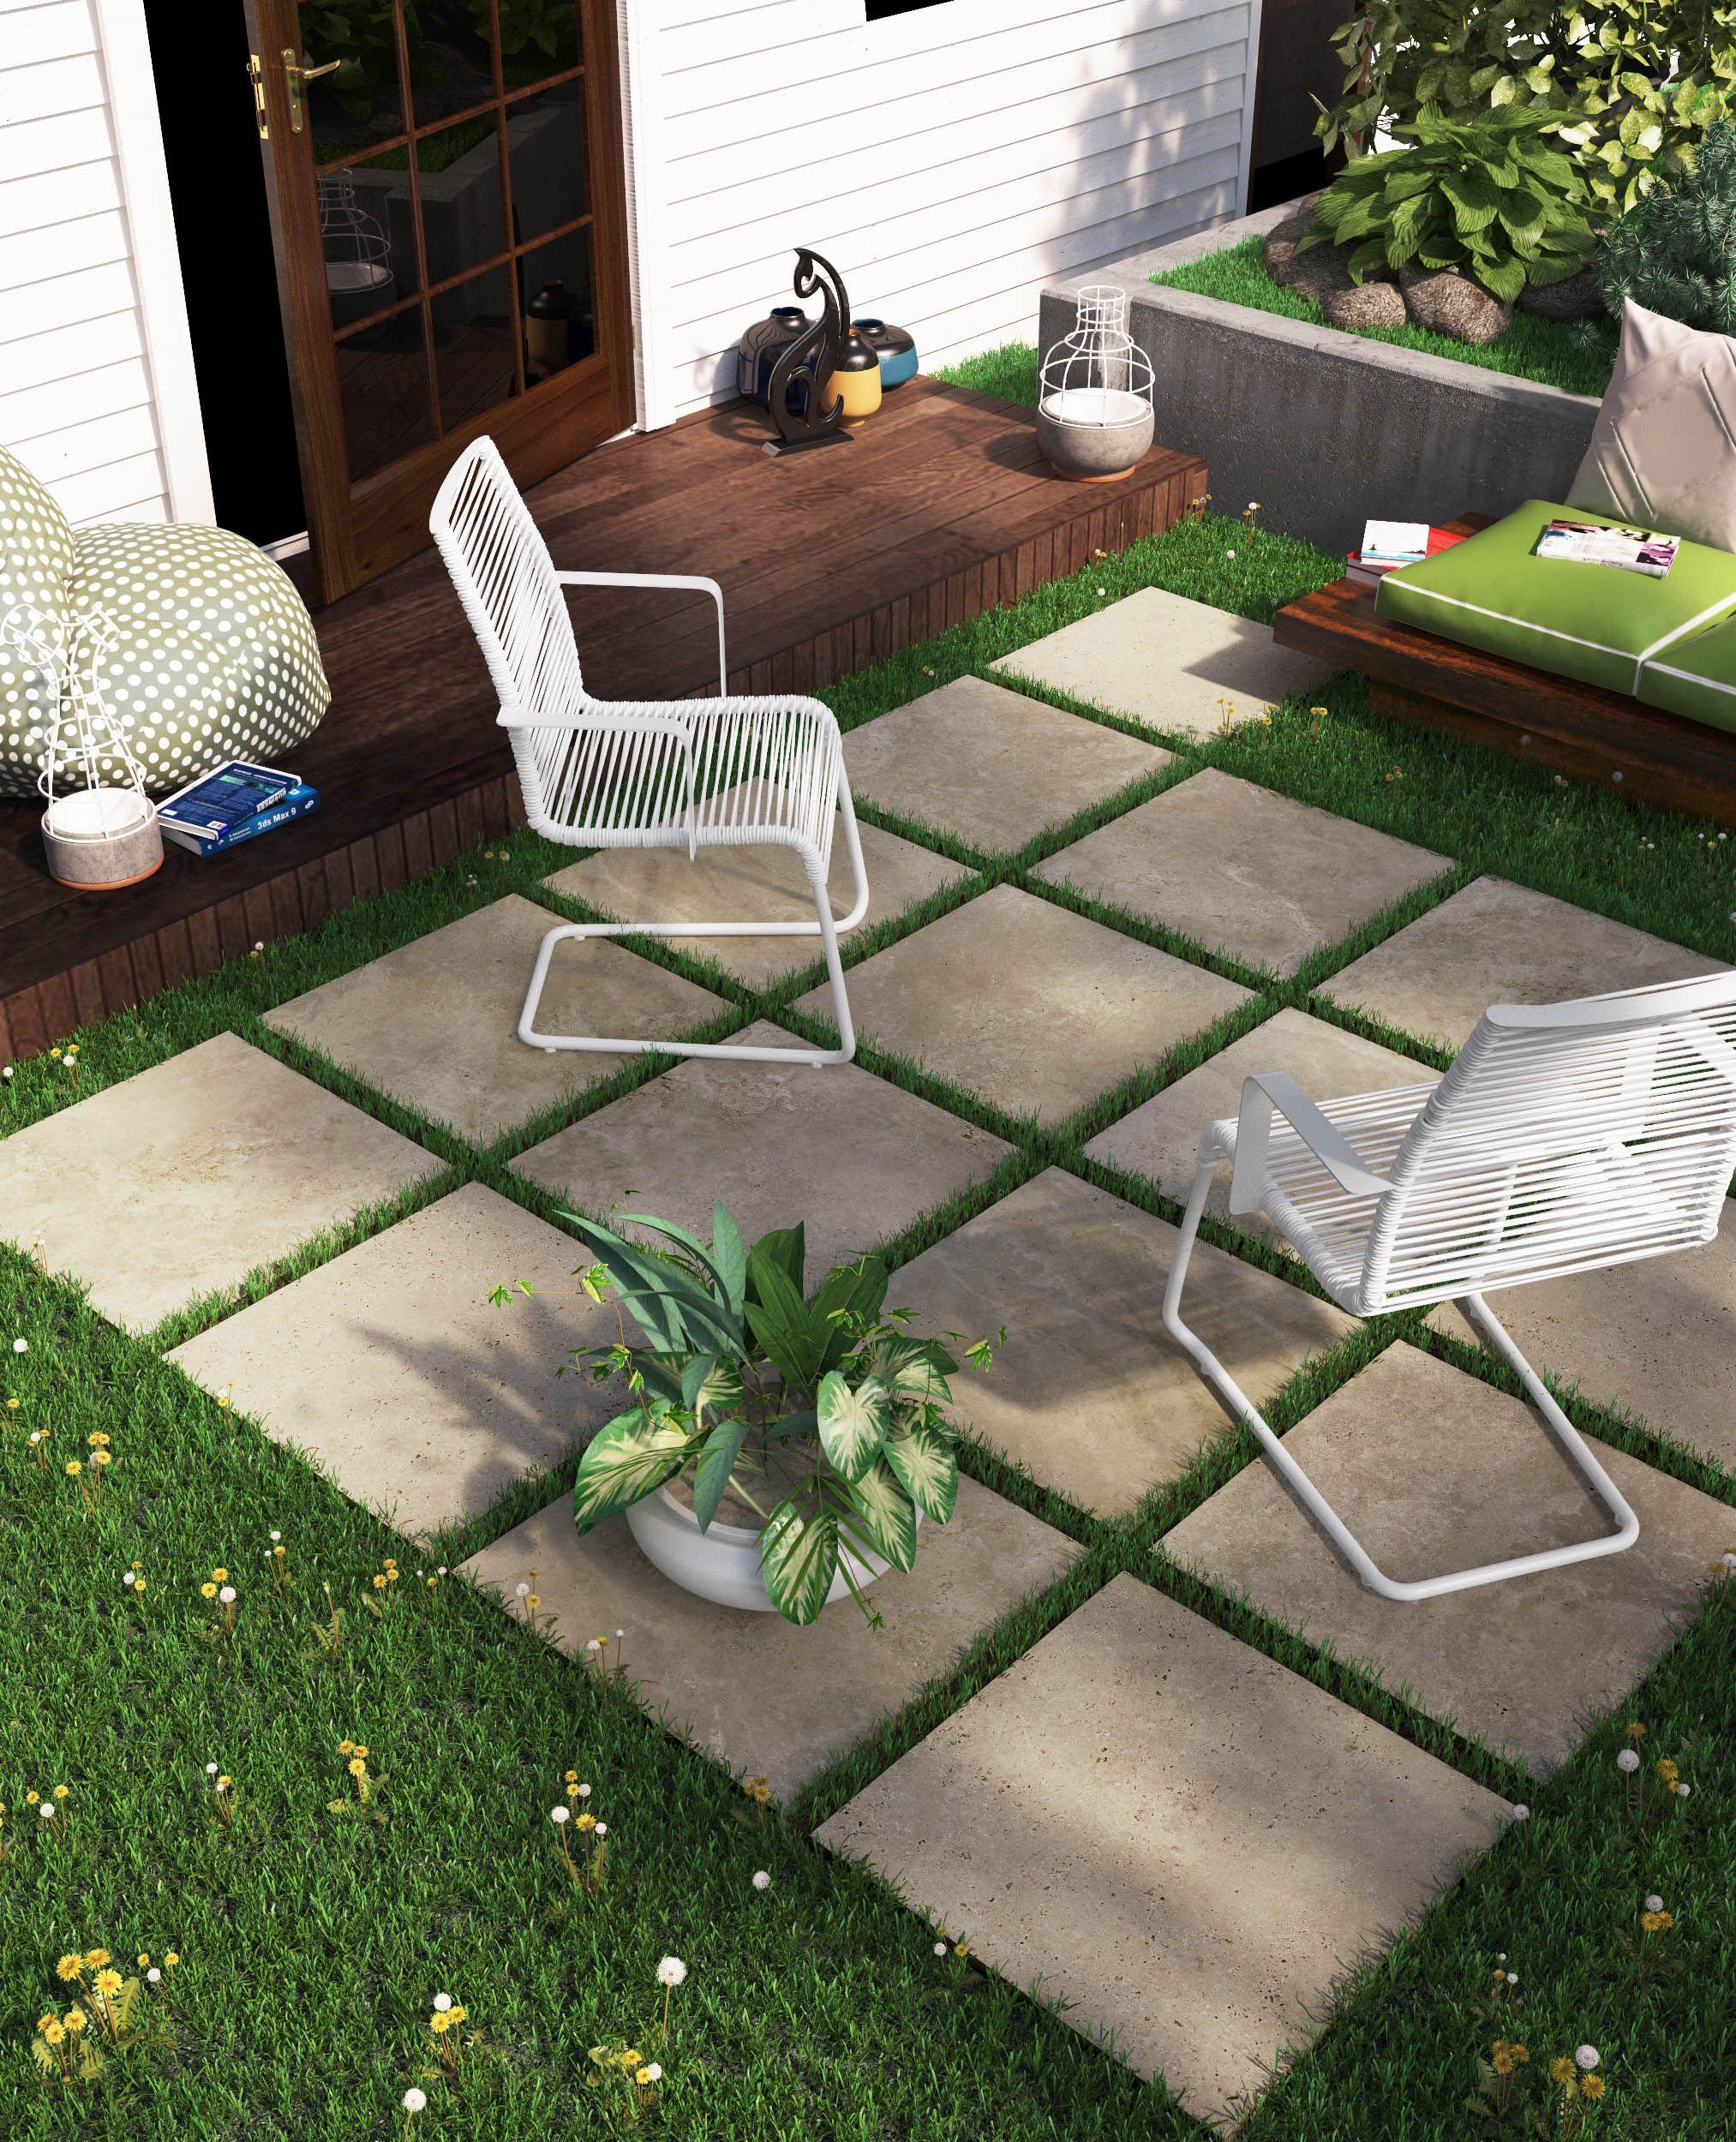 outdoor patio sitting area